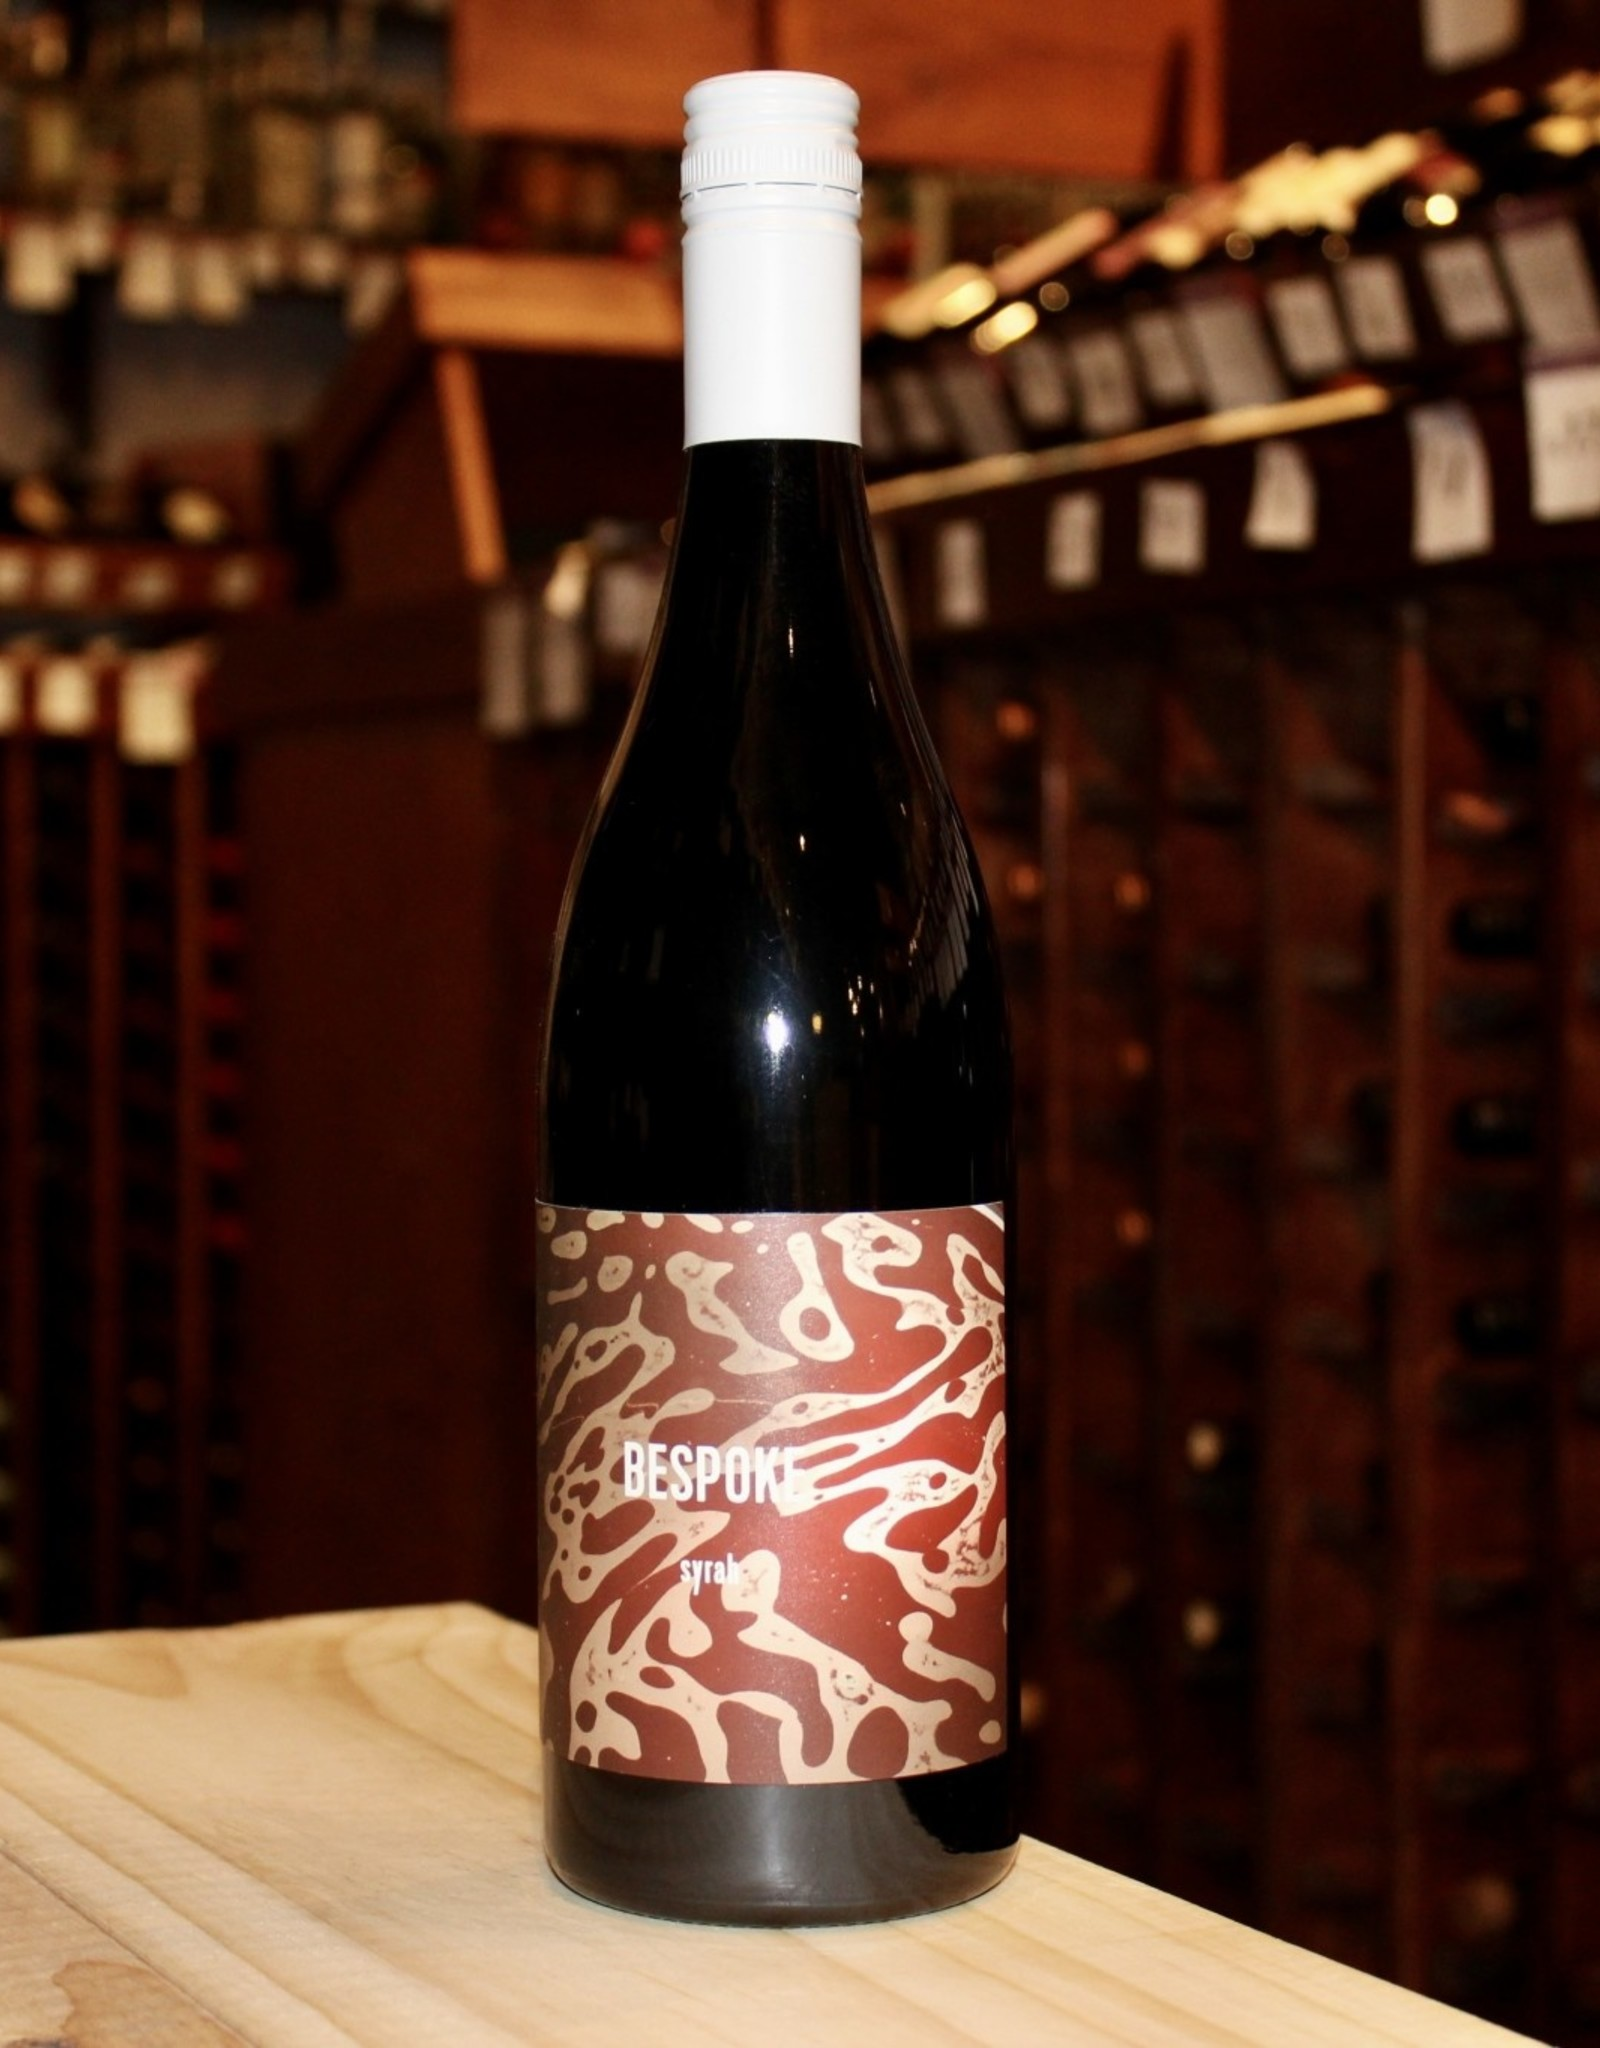 Wine 2018 Maison Lapalus Bertrand Bespoke Syrah  - Victoria, Australia (750ml)